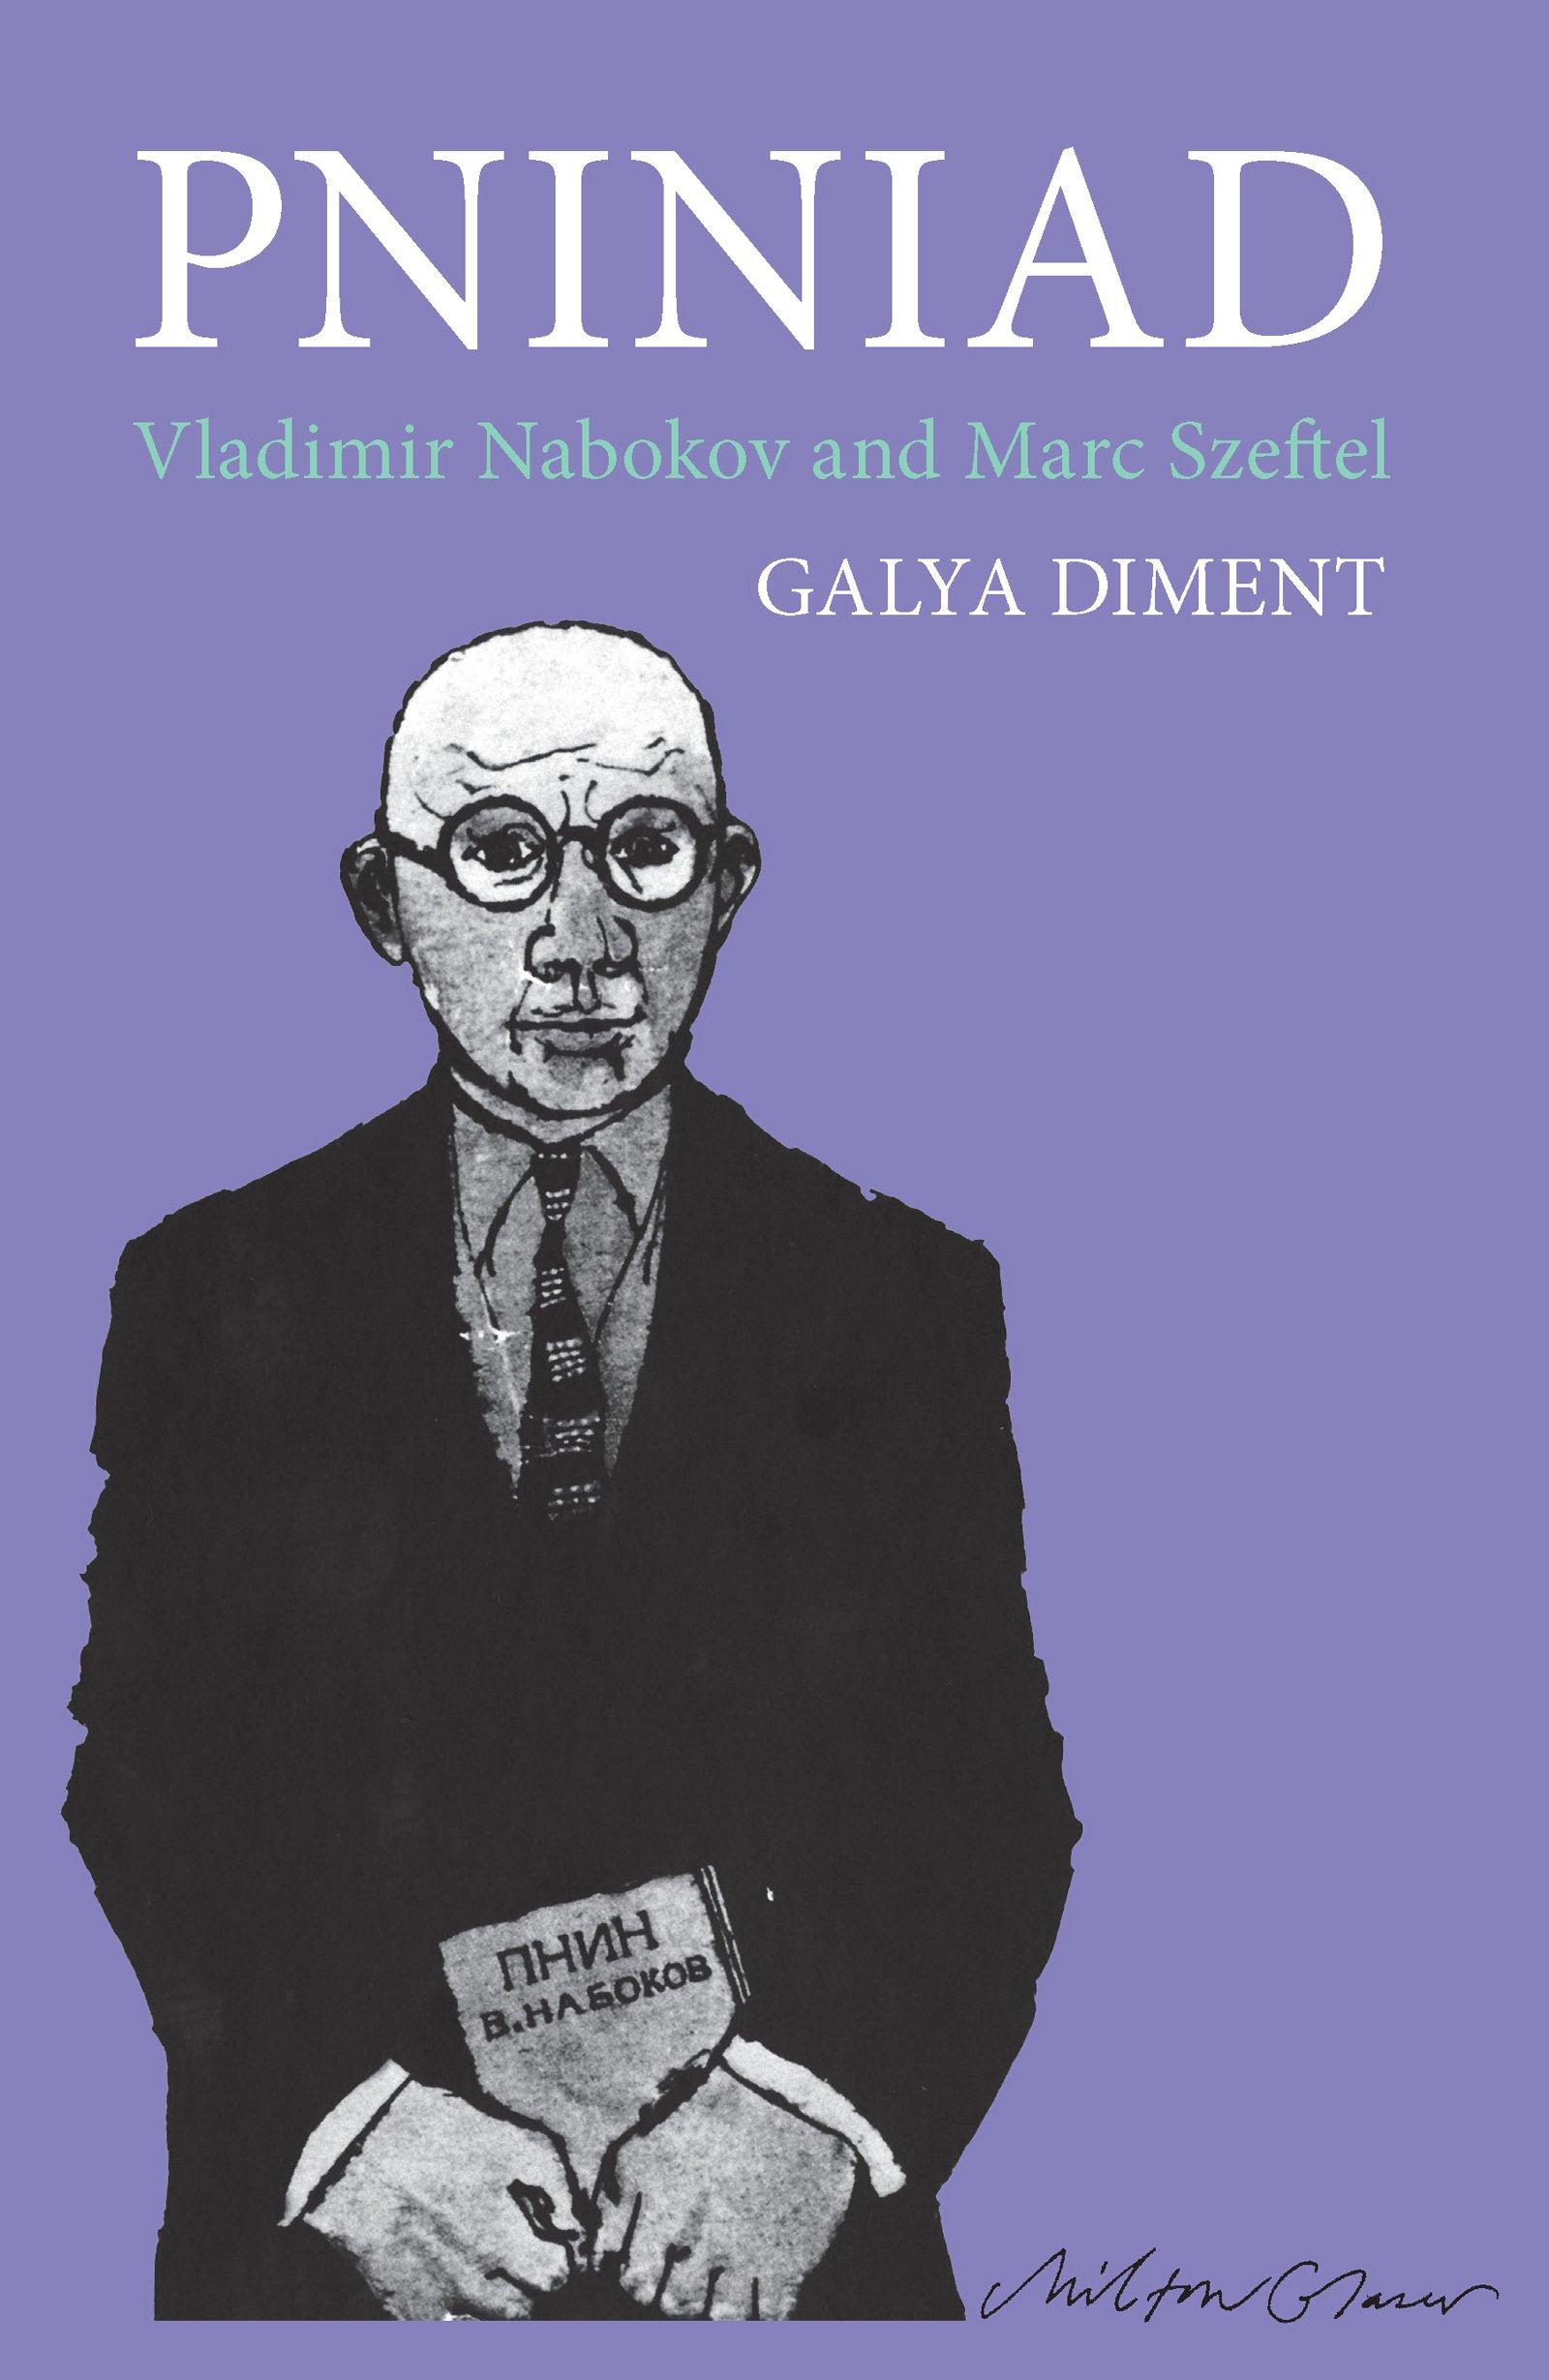 Pniniad: Vladimir Nabokov and Marc Szeftel (A McLellan Book) pdf